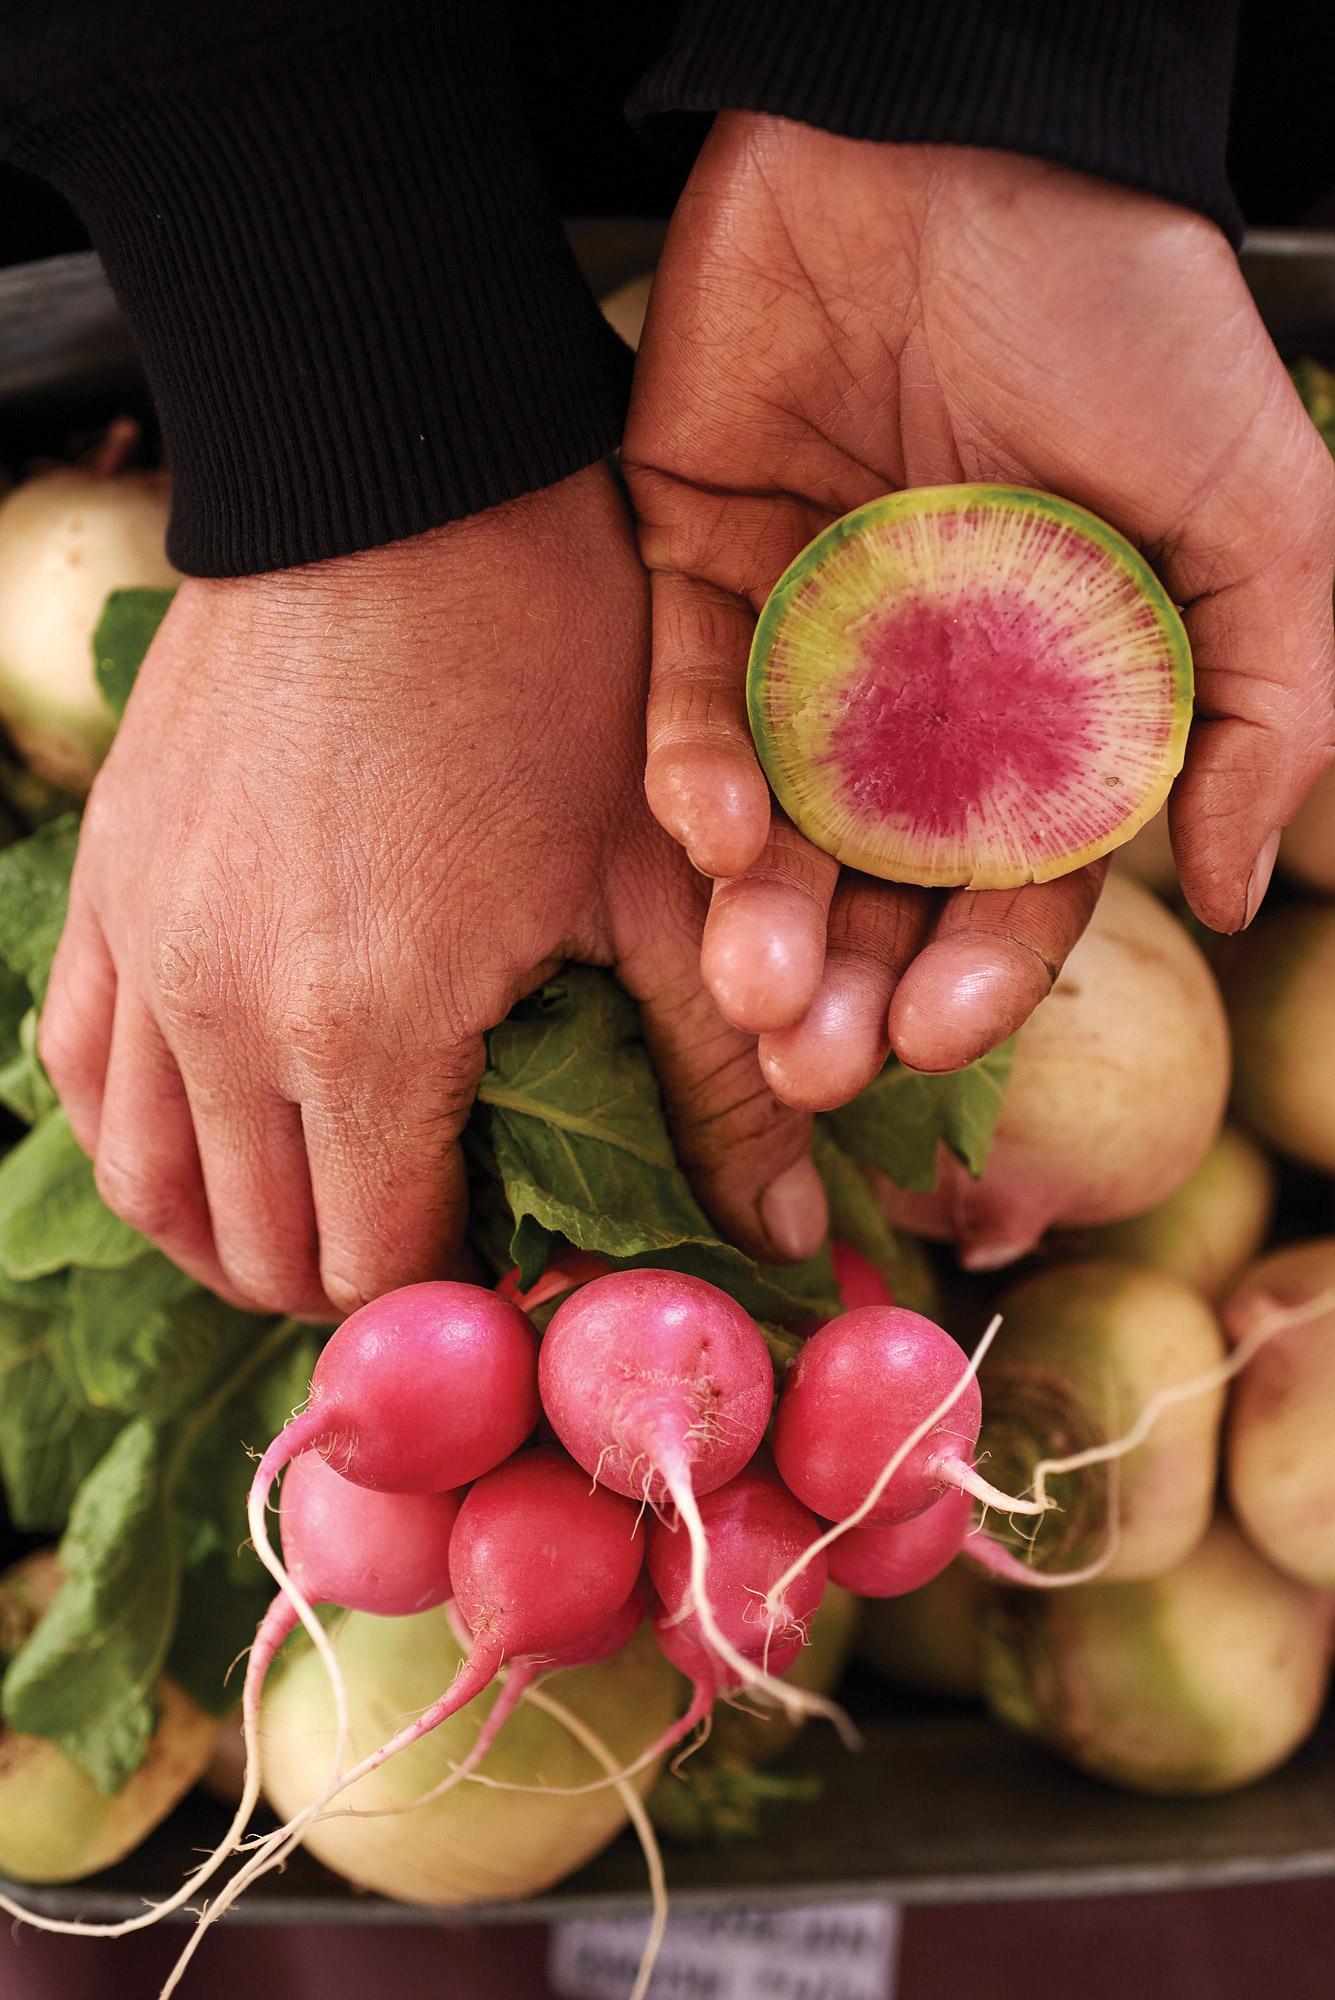 Emma Dosch, Weavers Way, watermelon radish and pink radish